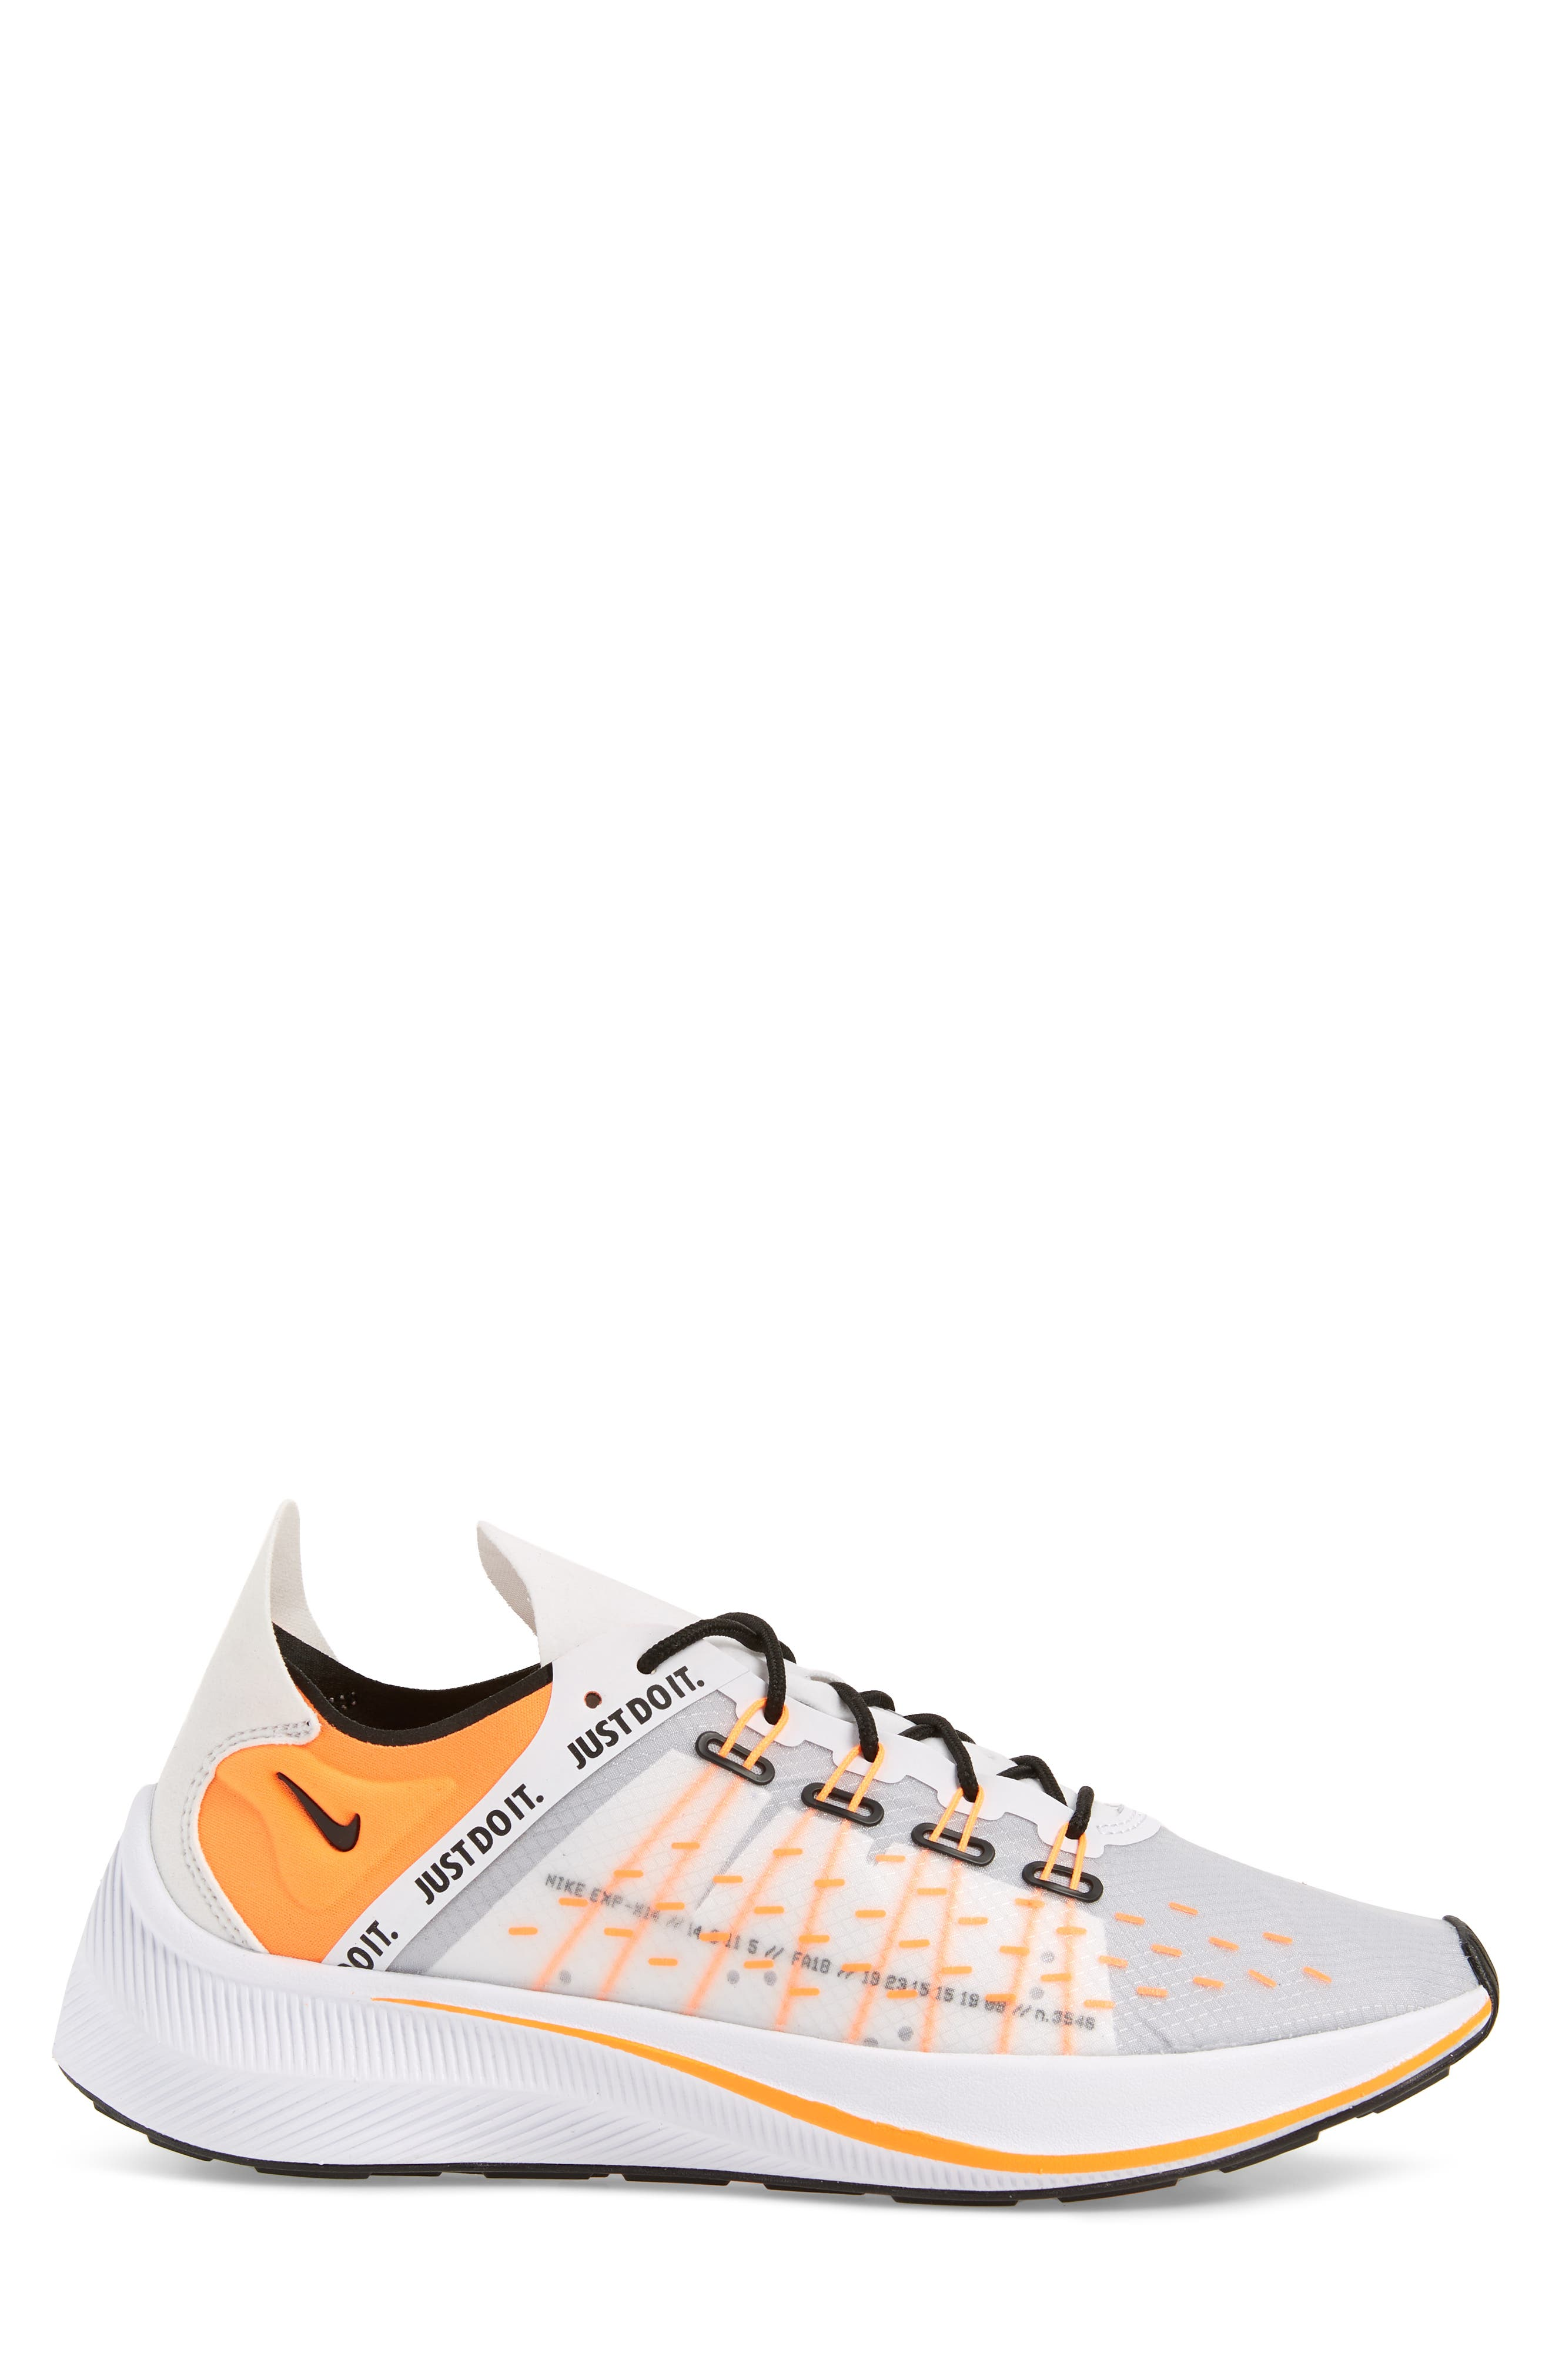 EXP-X14 Just Do It Sneaker,                             Alternate thumbnail 3, color,                             100